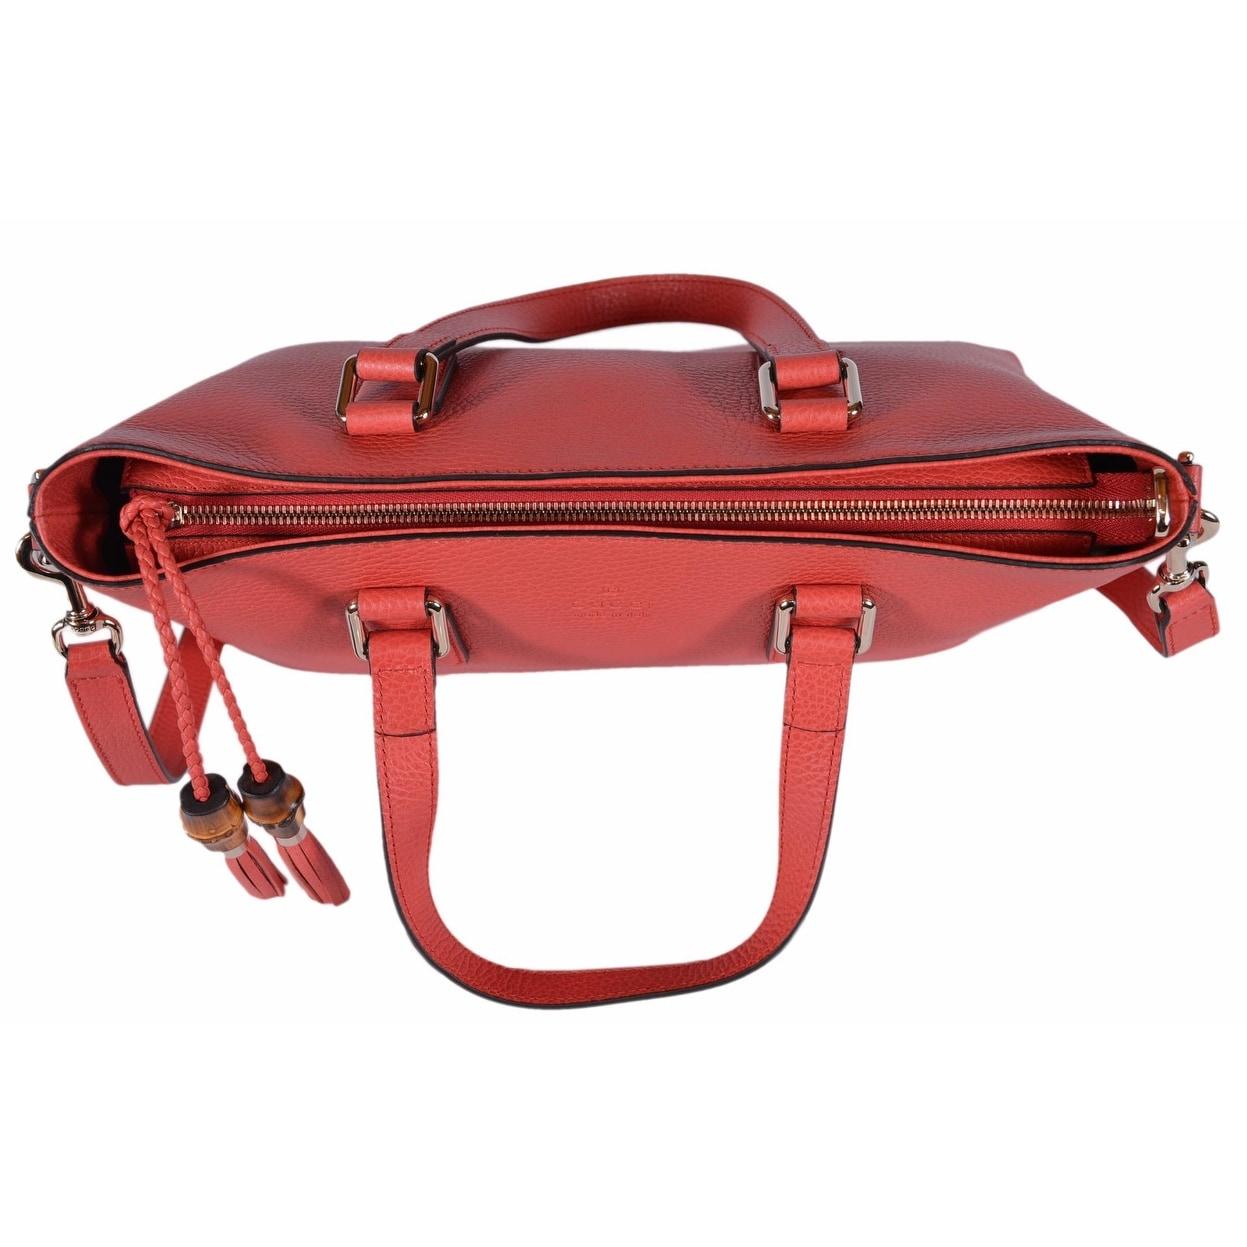 d7f2c2baba3 Shop Gucci 365346 Medium Coral Red Leather Bamboo Tassel Crossbody Handbag  Purse - sporting red - 14.5